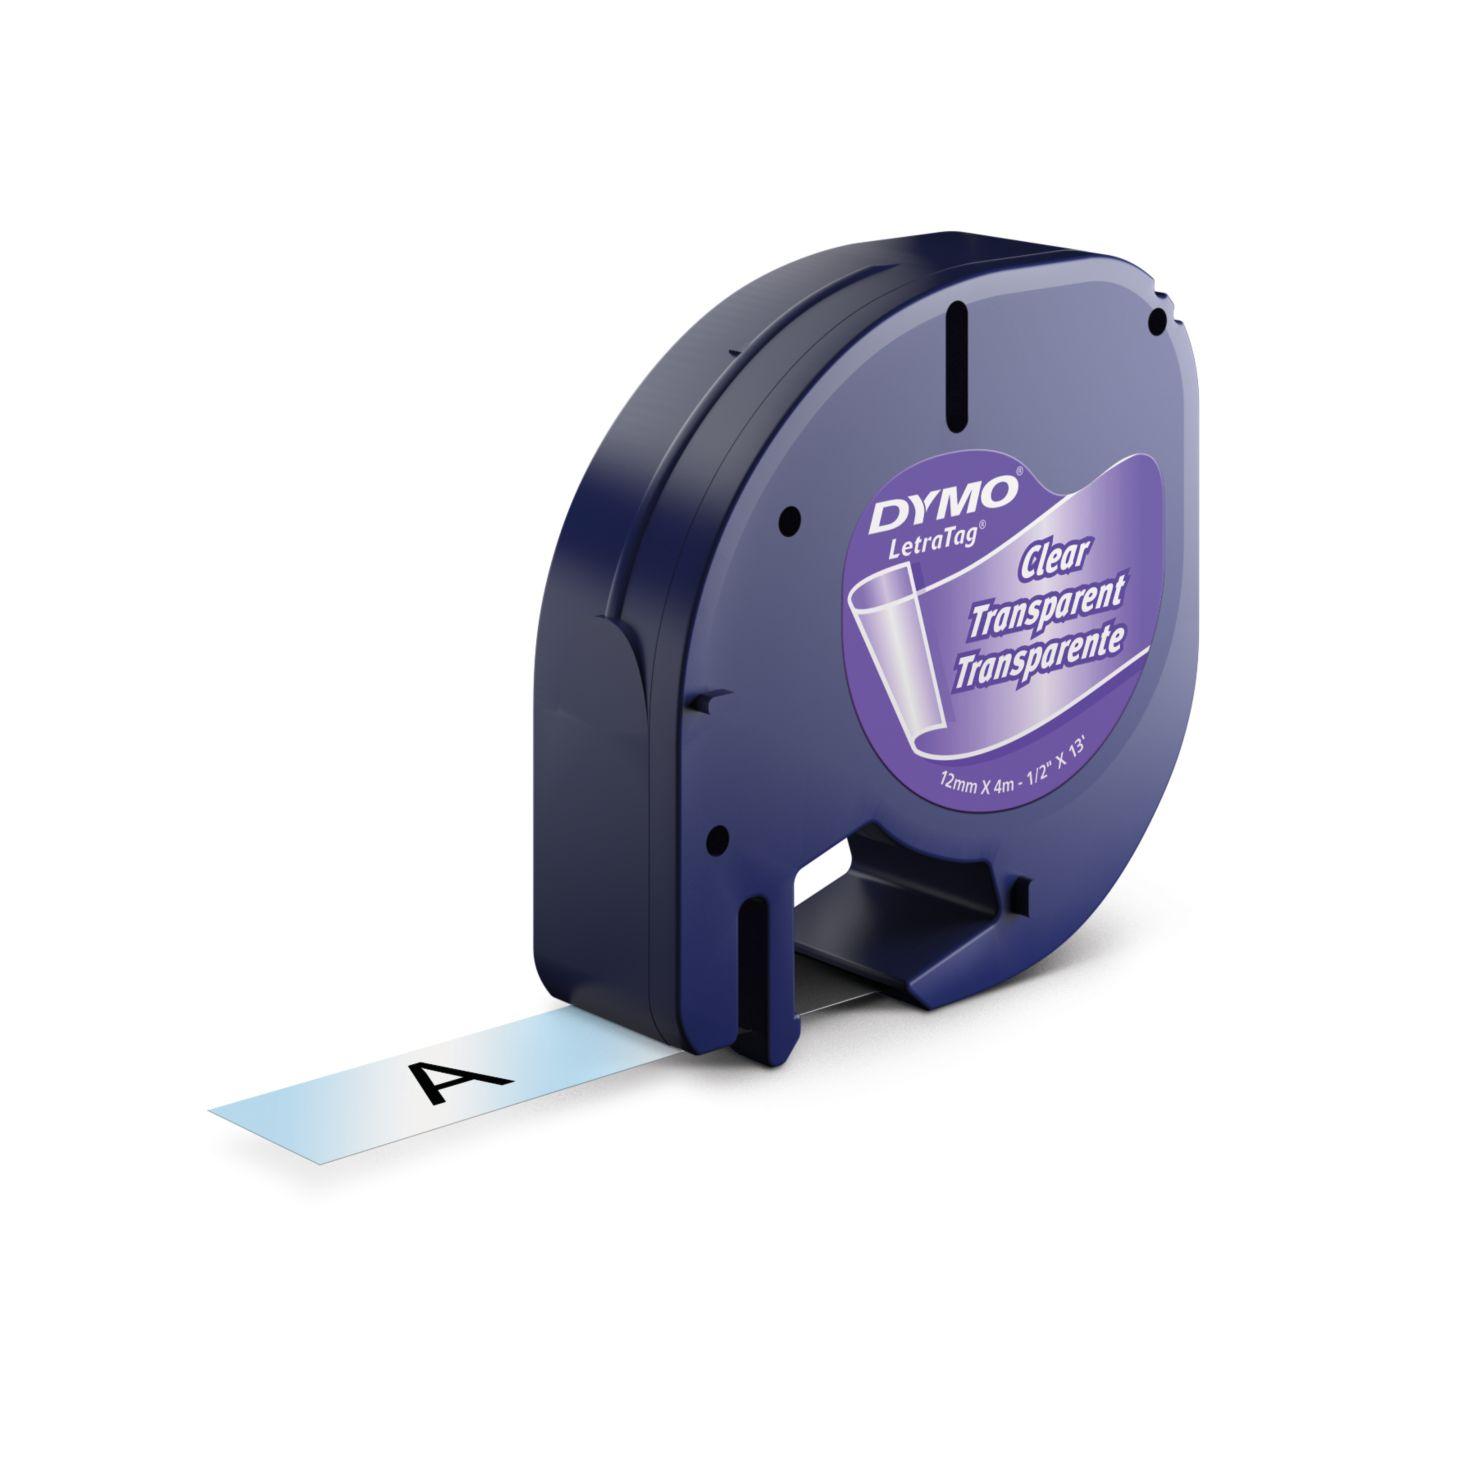 Dymo Letra Tag-Schriftband Plastik 12mm x 4m schwarz auf transparent